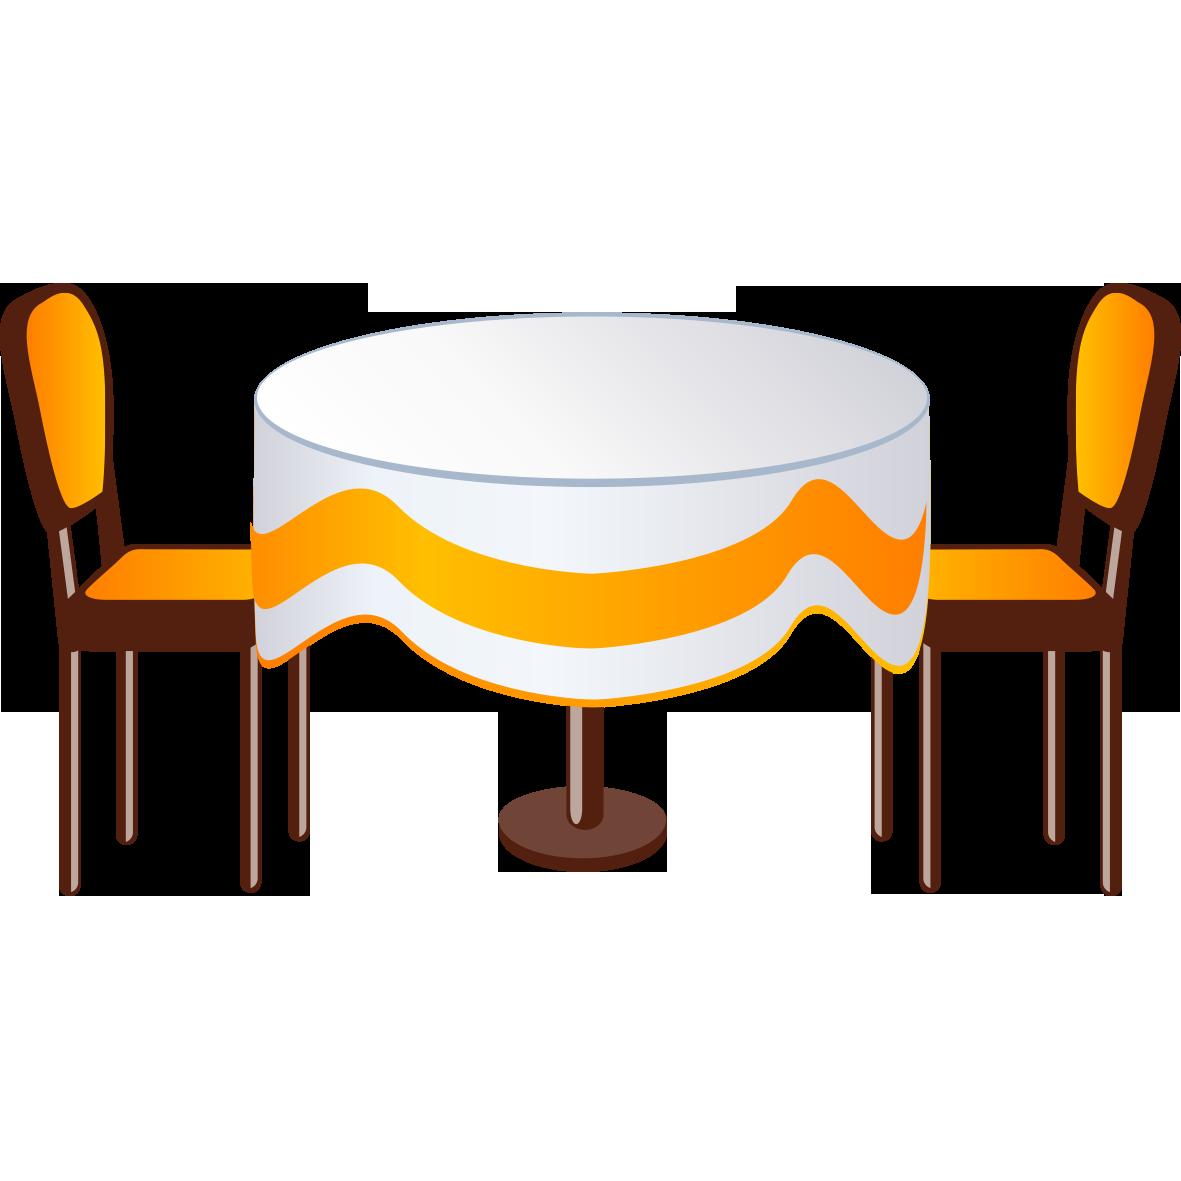 Table Furniture Clip art.